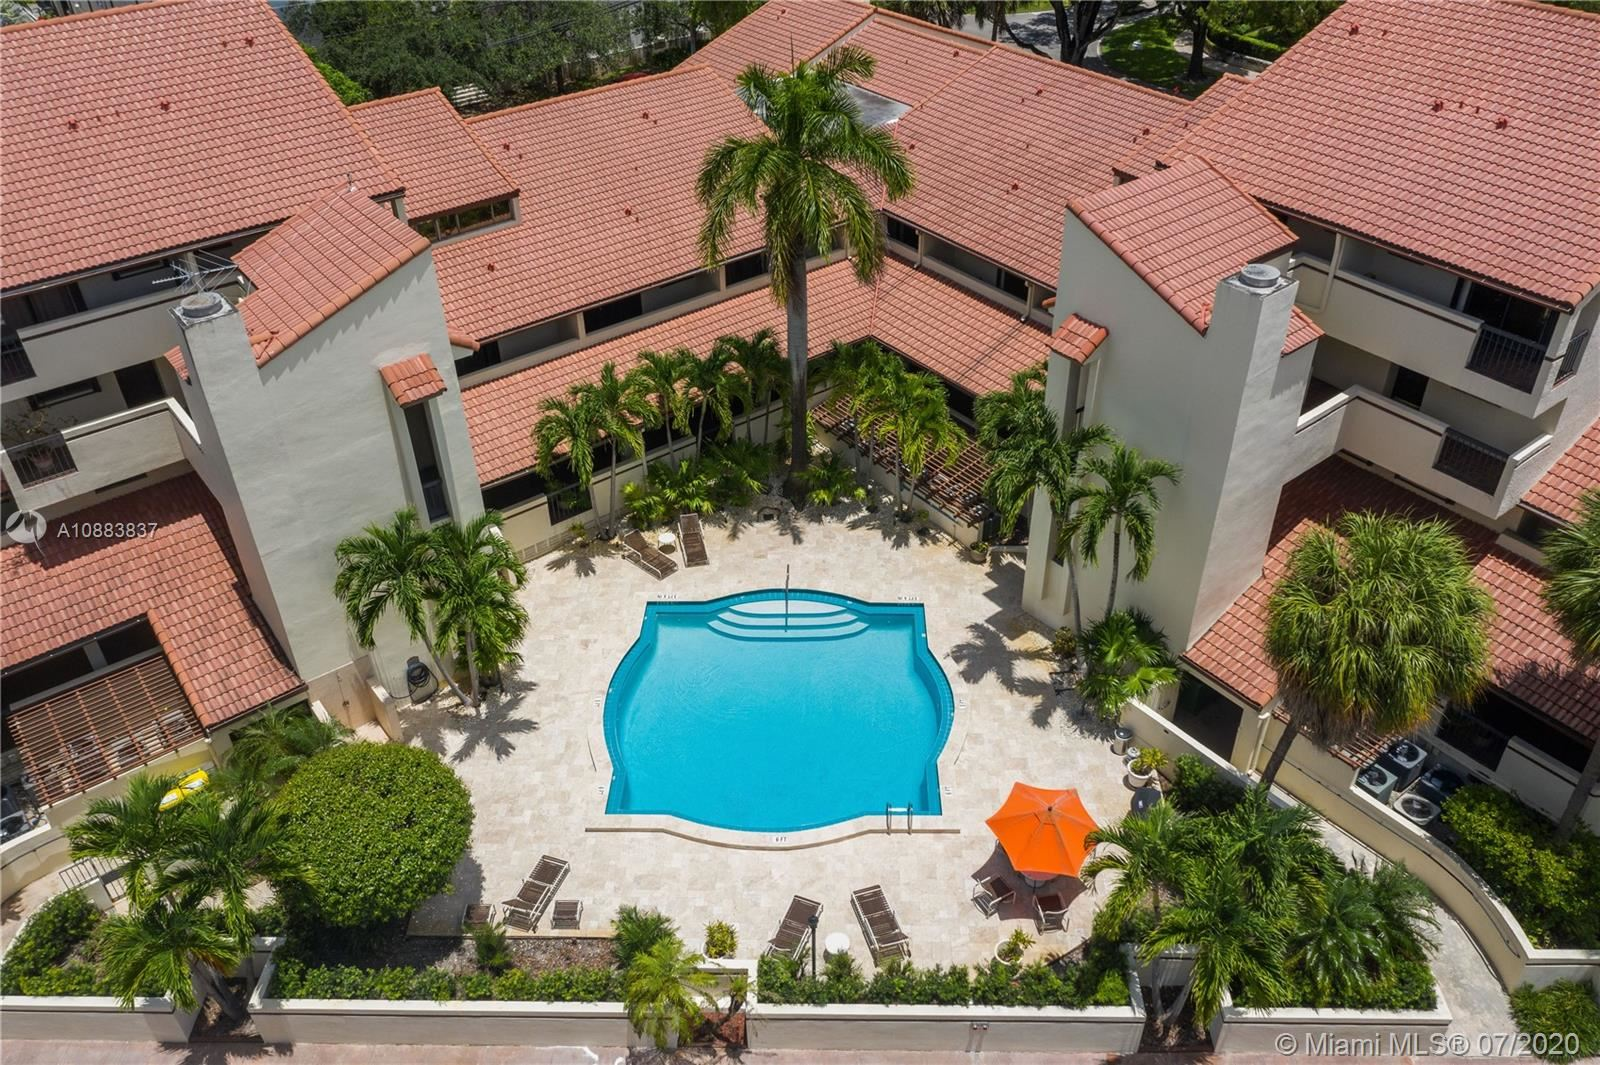 2600 Cardena St #15, Coral Gables, FL 33134 - #: A10883837